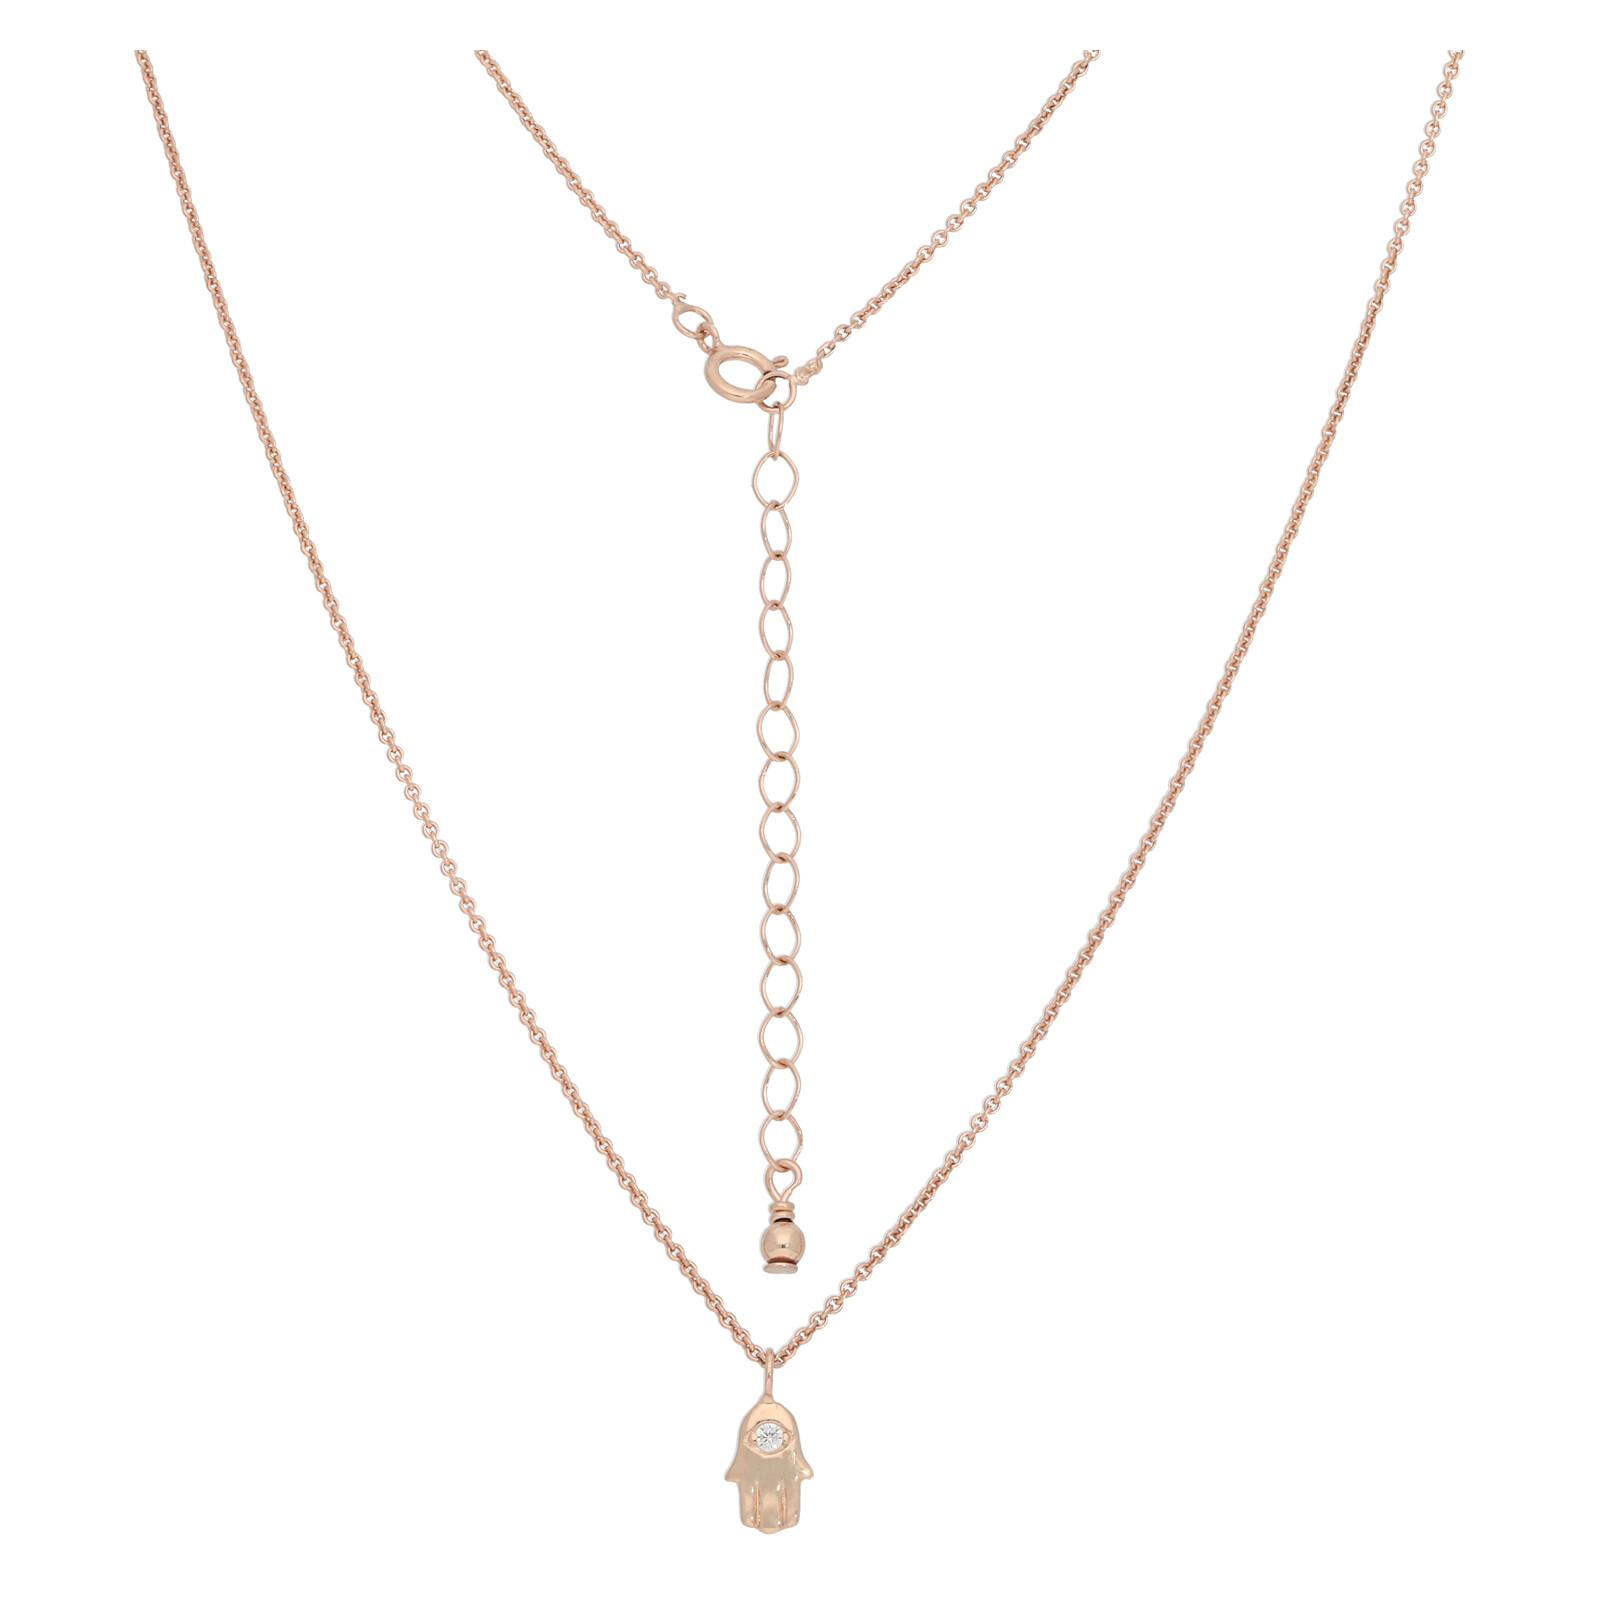 Halskette Hand der Fatima rosevergoldet echt Silber